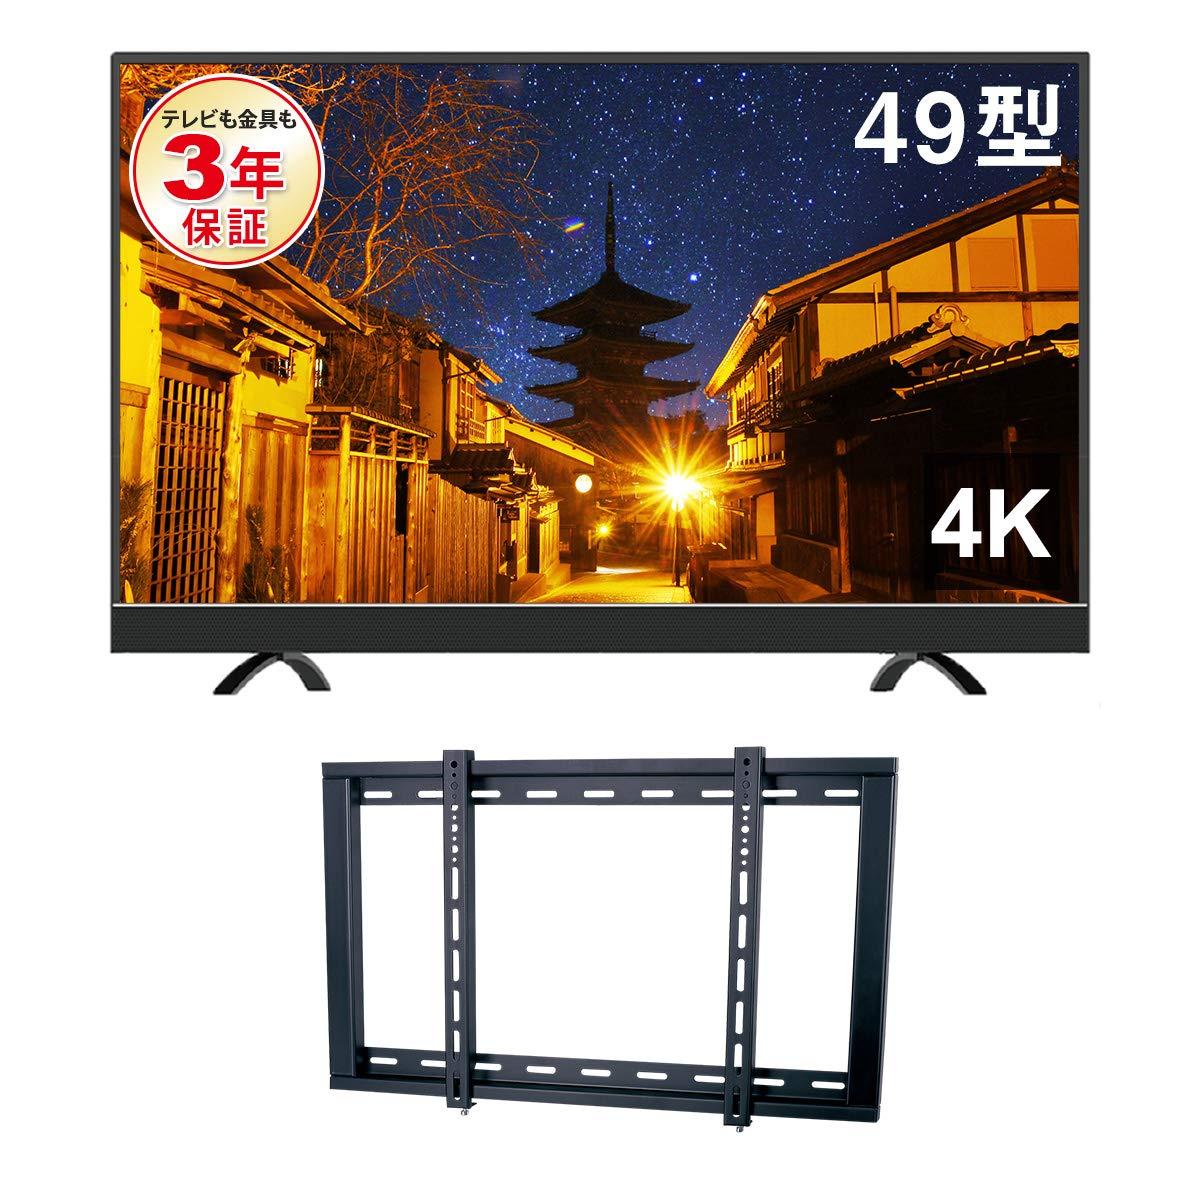 maxzen 49V型 4K液晶テレビ+壁掛け金具セット 薄さ38mm スリム設置 安定感抜群 [maxzen JU49SK03+STARPLATINUM TVセッタースリムGP104 Mサイズ ブラック] B07G5BPXRL ブラック